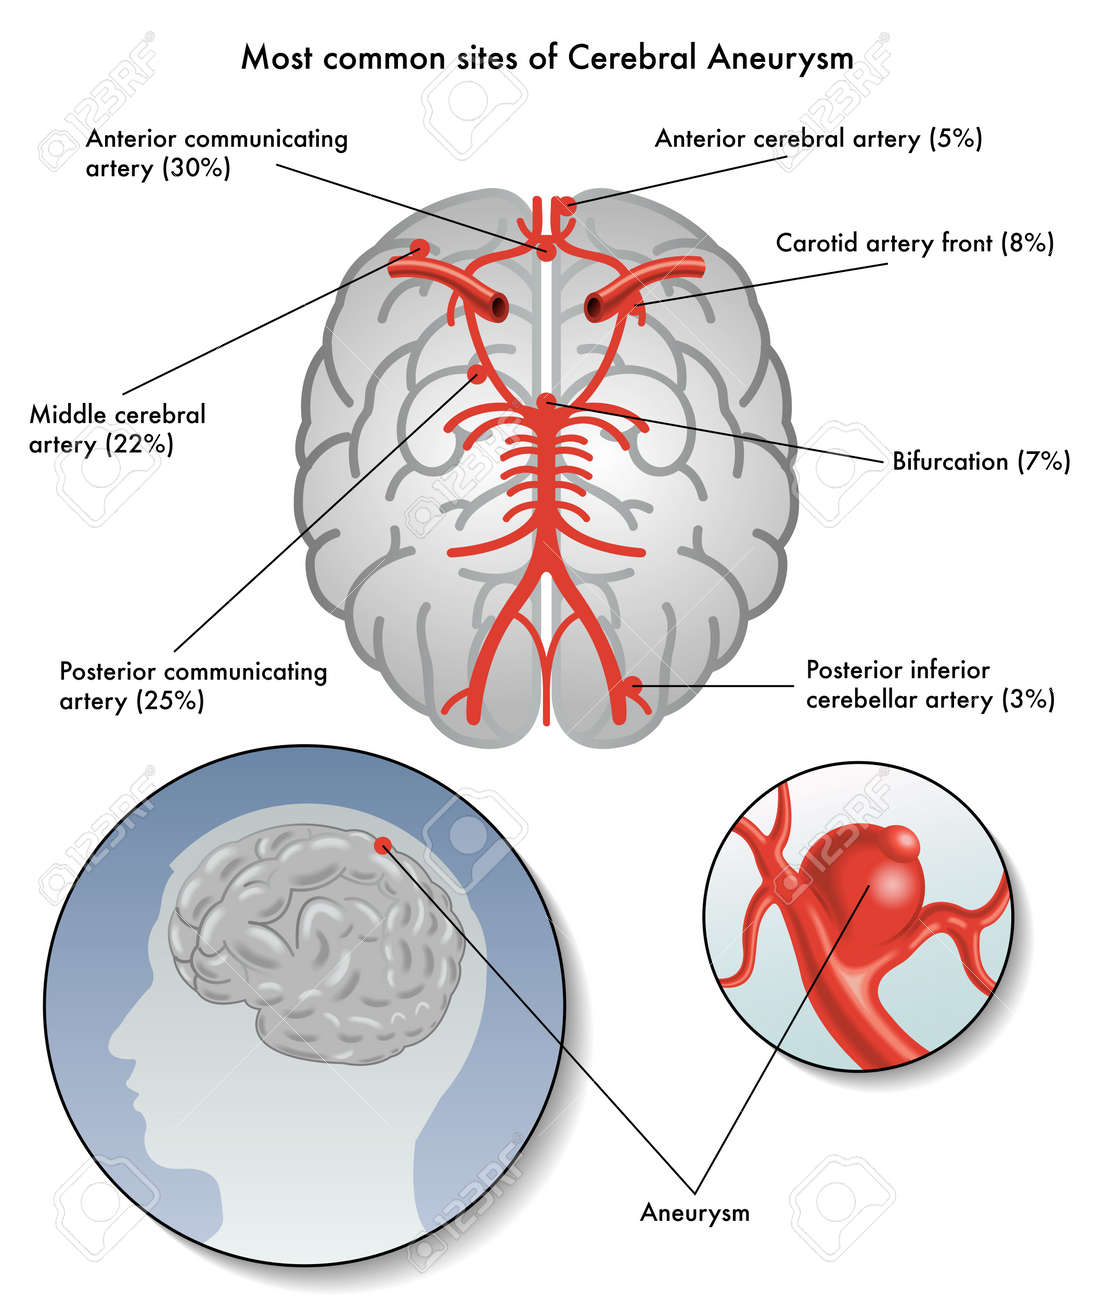 sites of cerebral aneurysm - 31401522